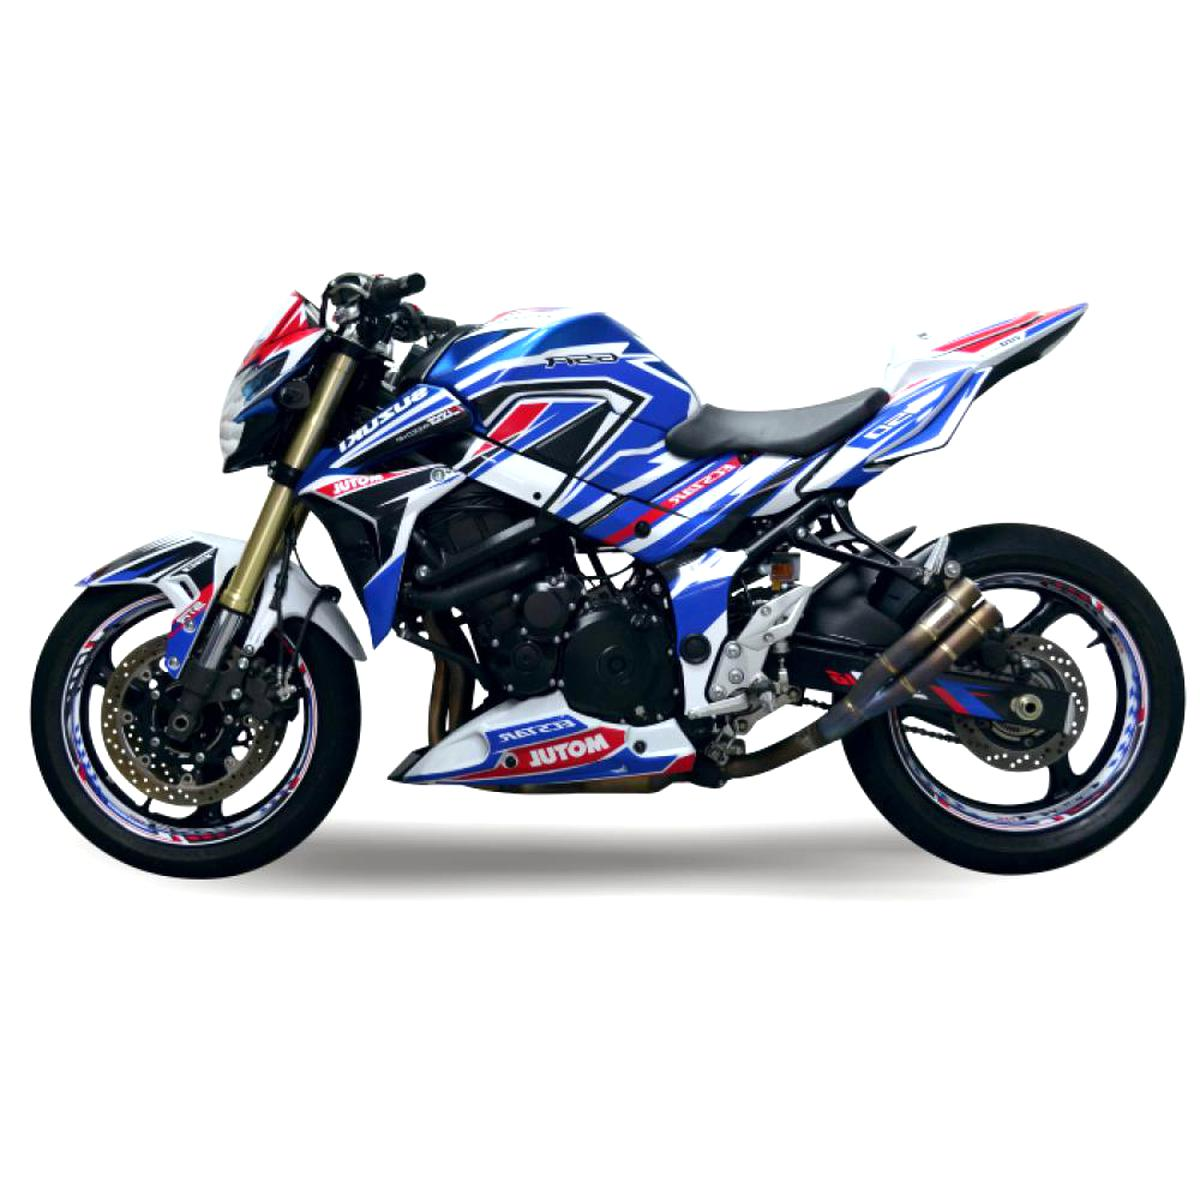 IMPRESSIATA Liserets de Jantes SpecialGP Moto Suzuki GSR 600 Blanche Autocollants